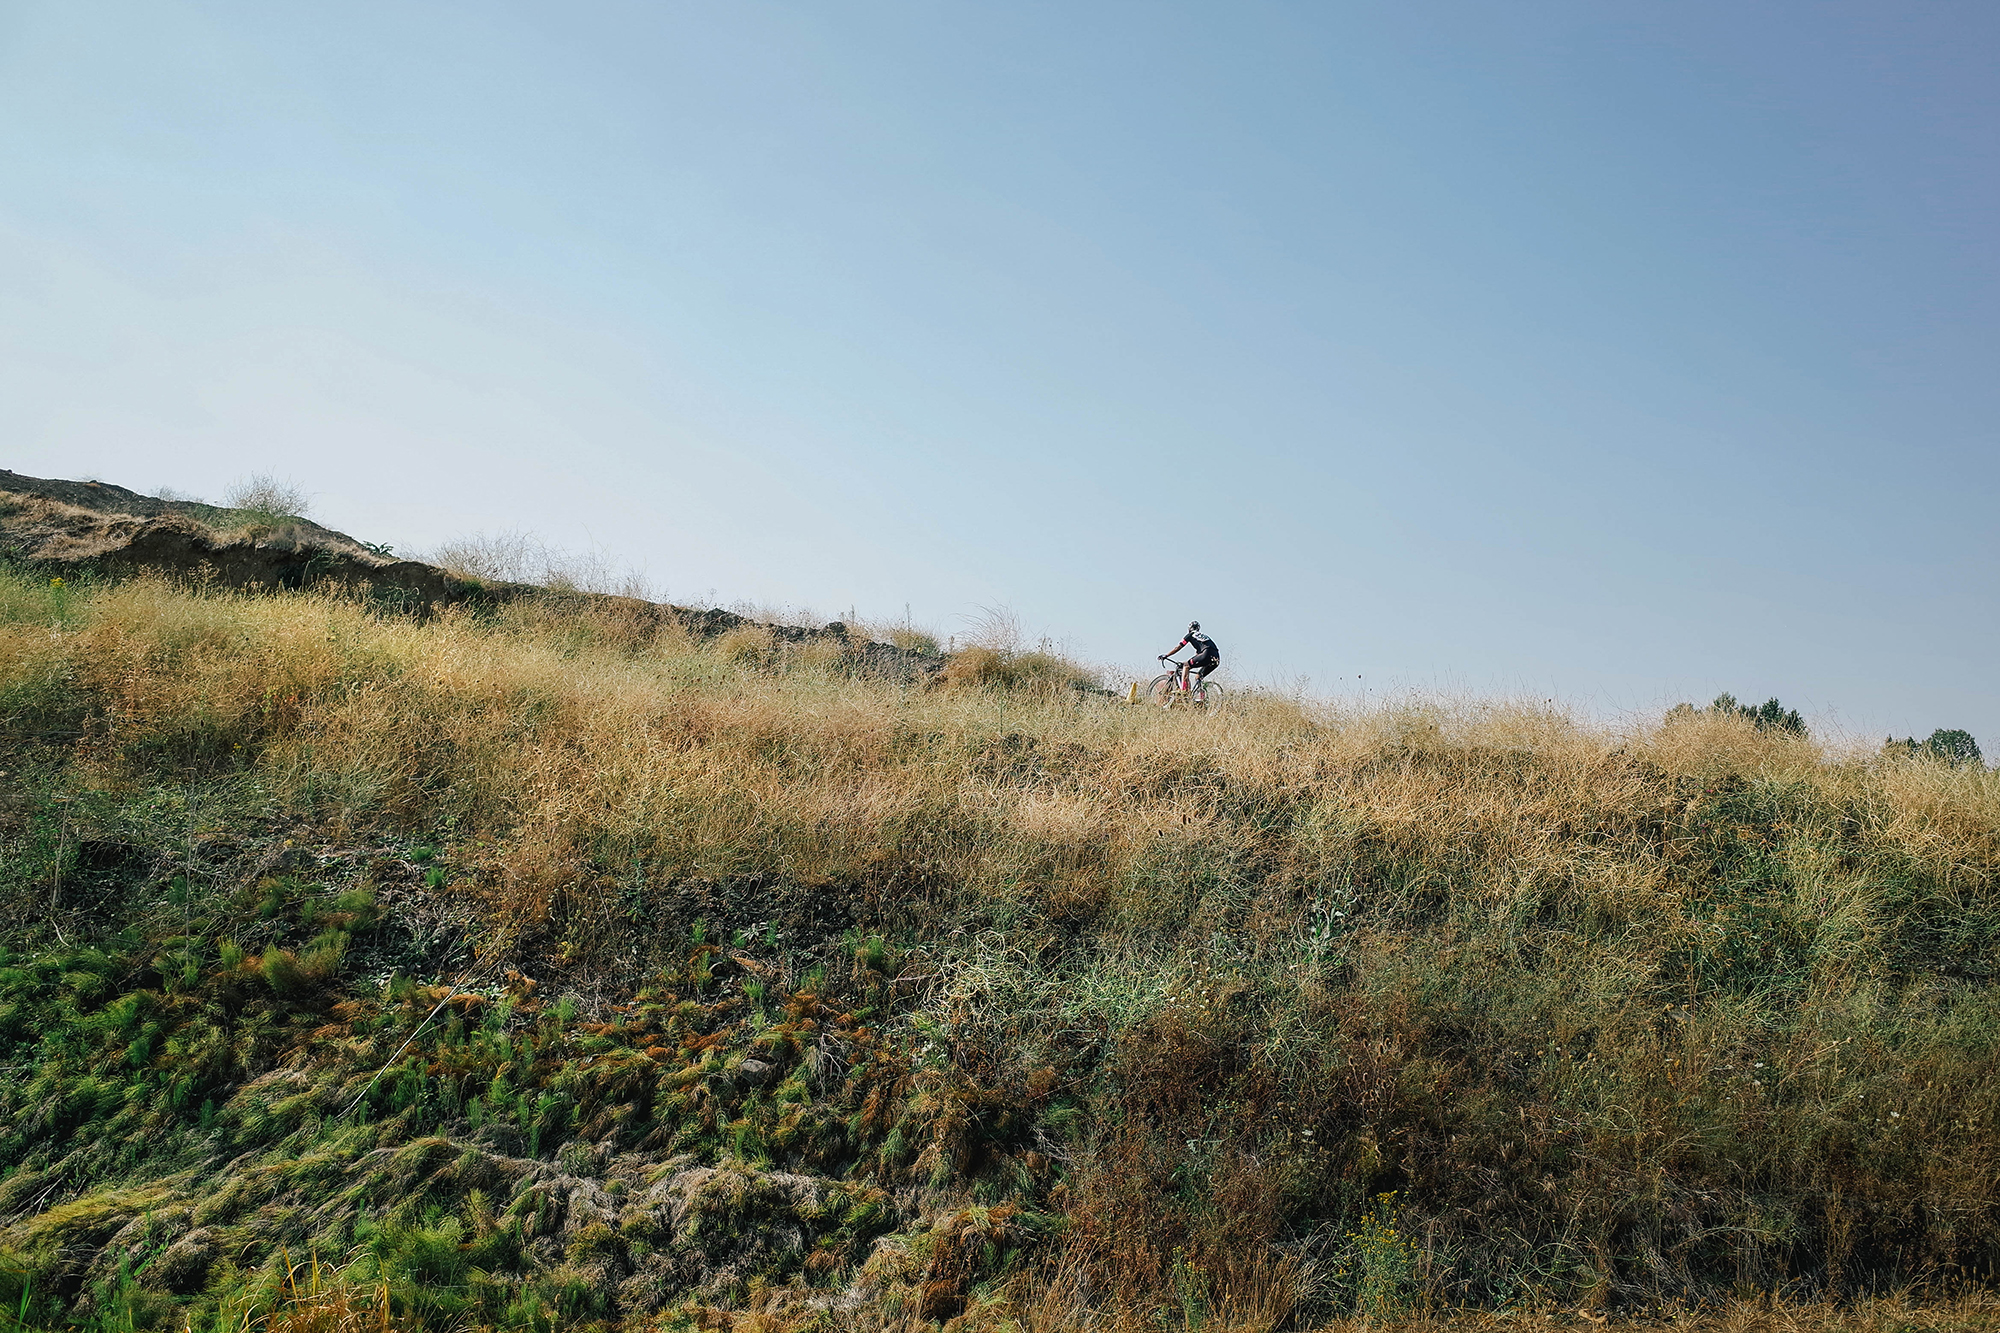 Me climbing solo.